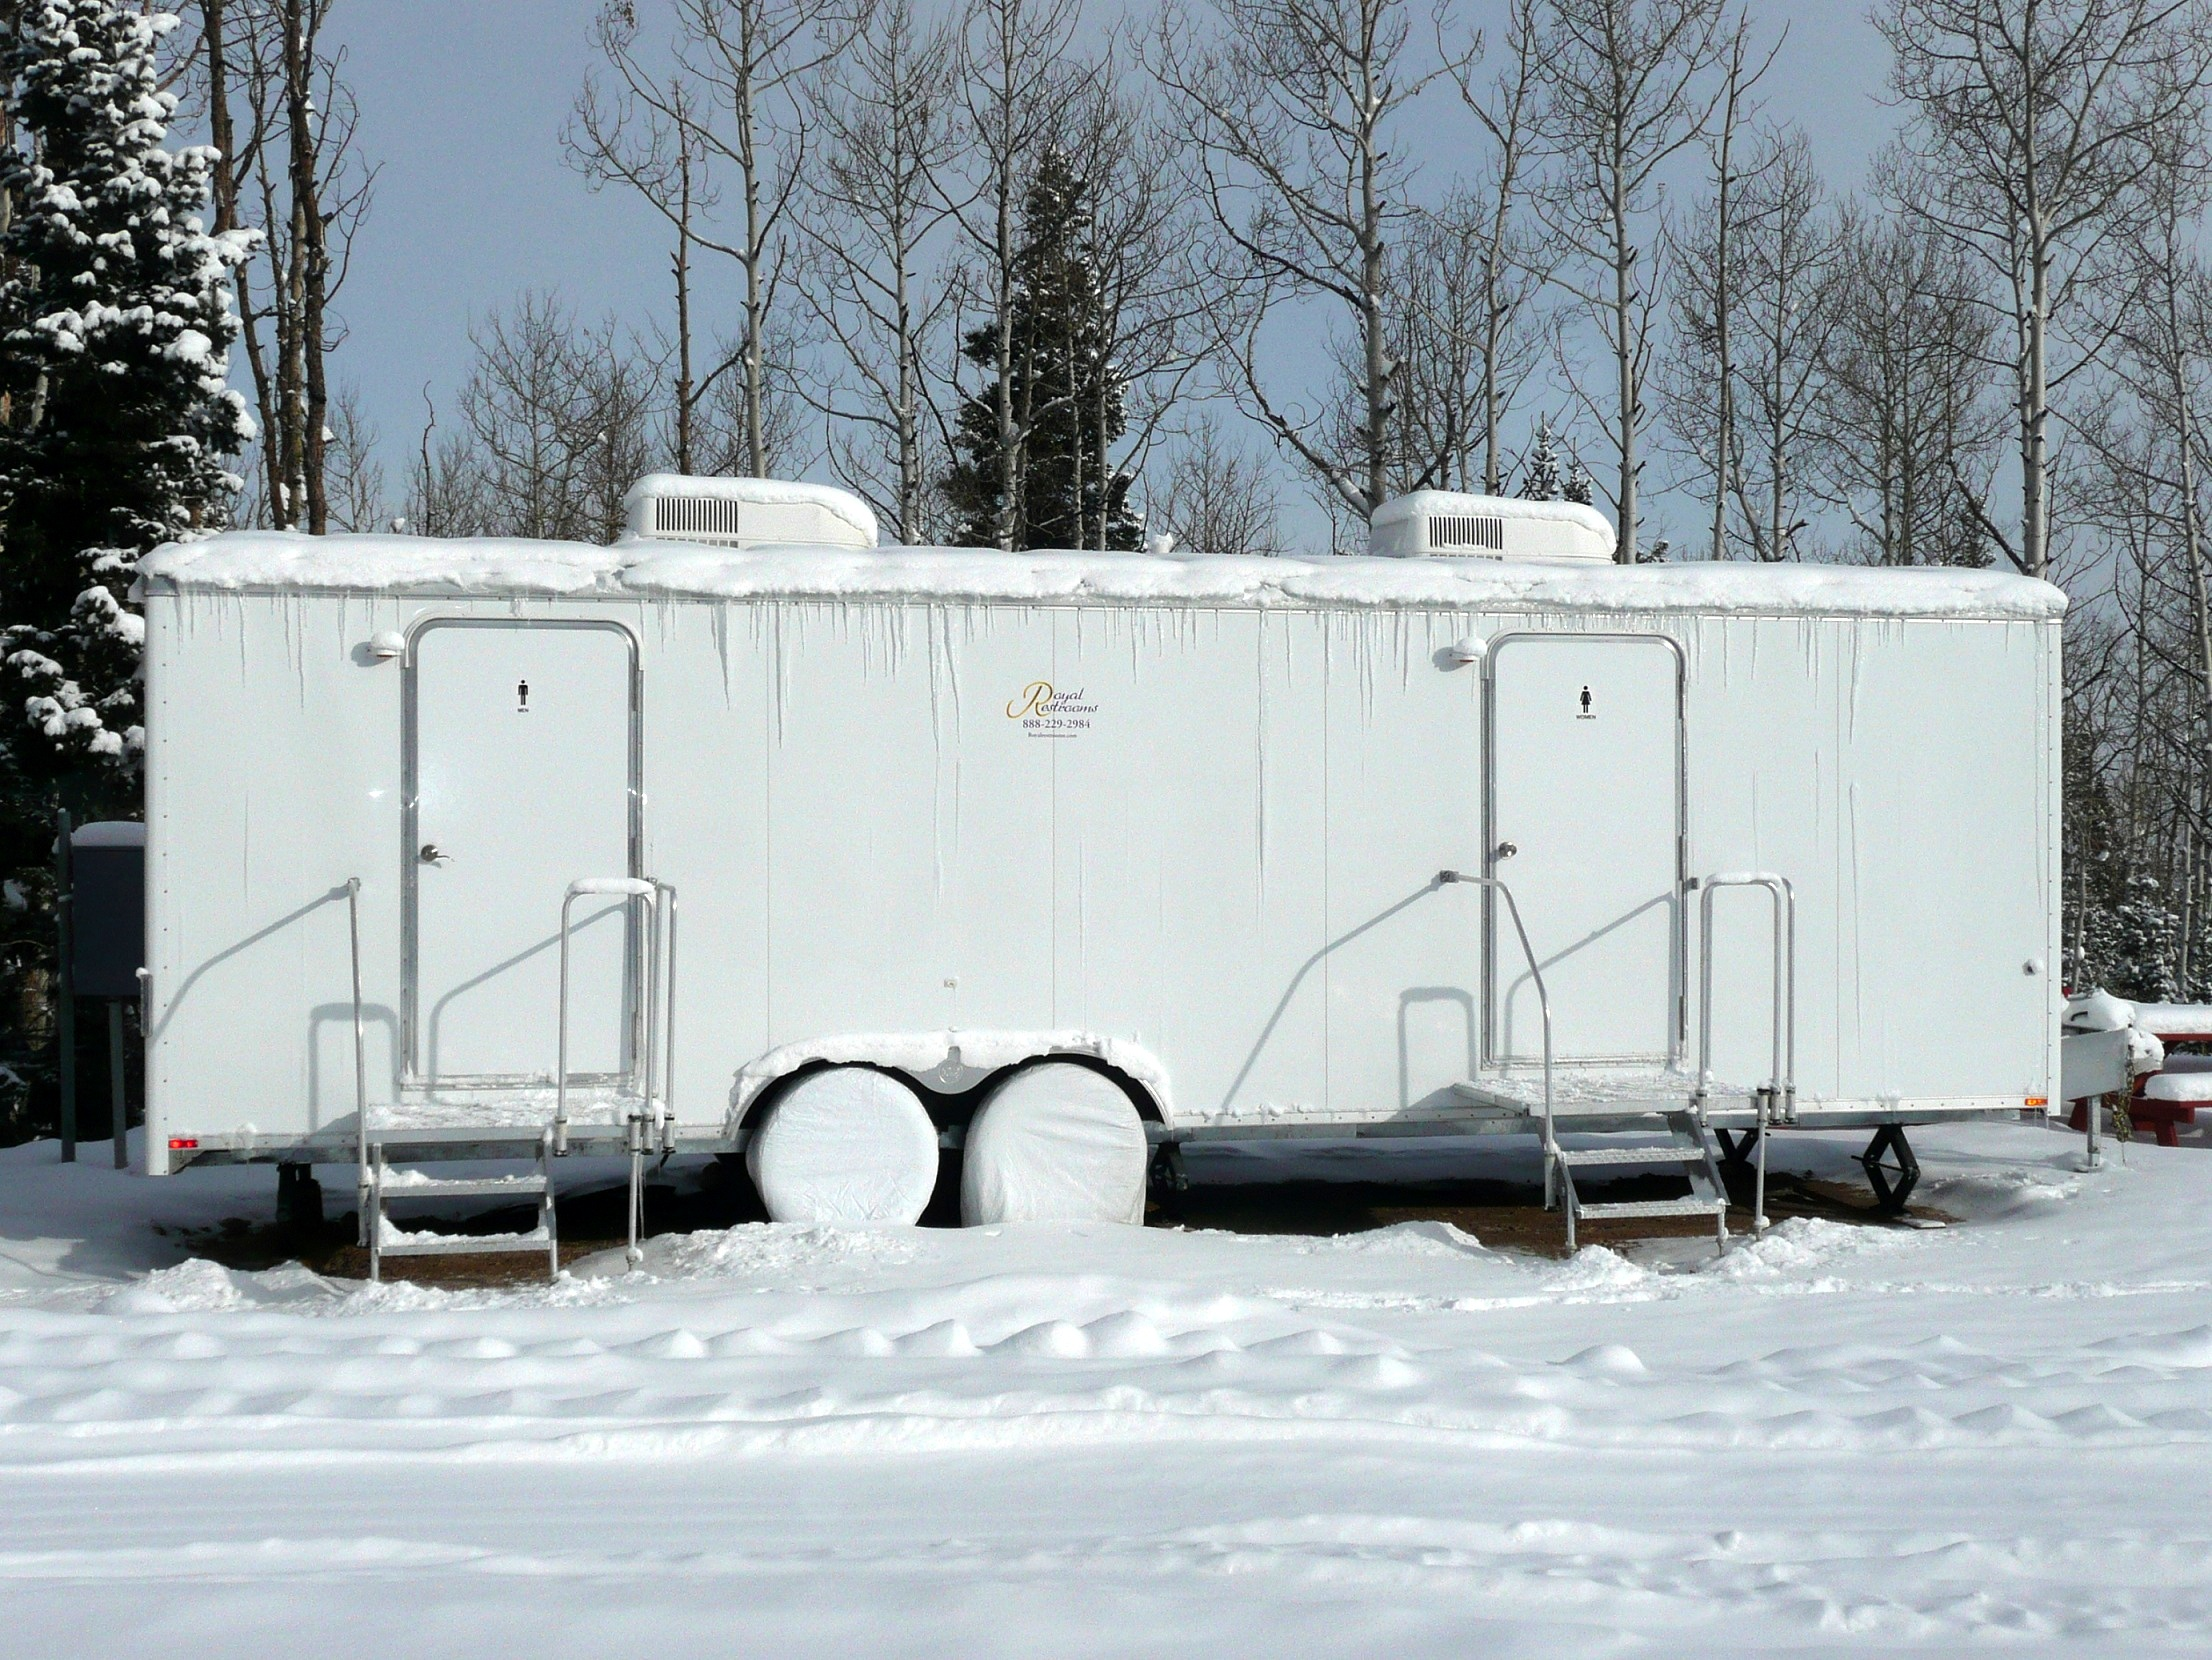 utah-portable-restrooms-at-canyons-resort-iii